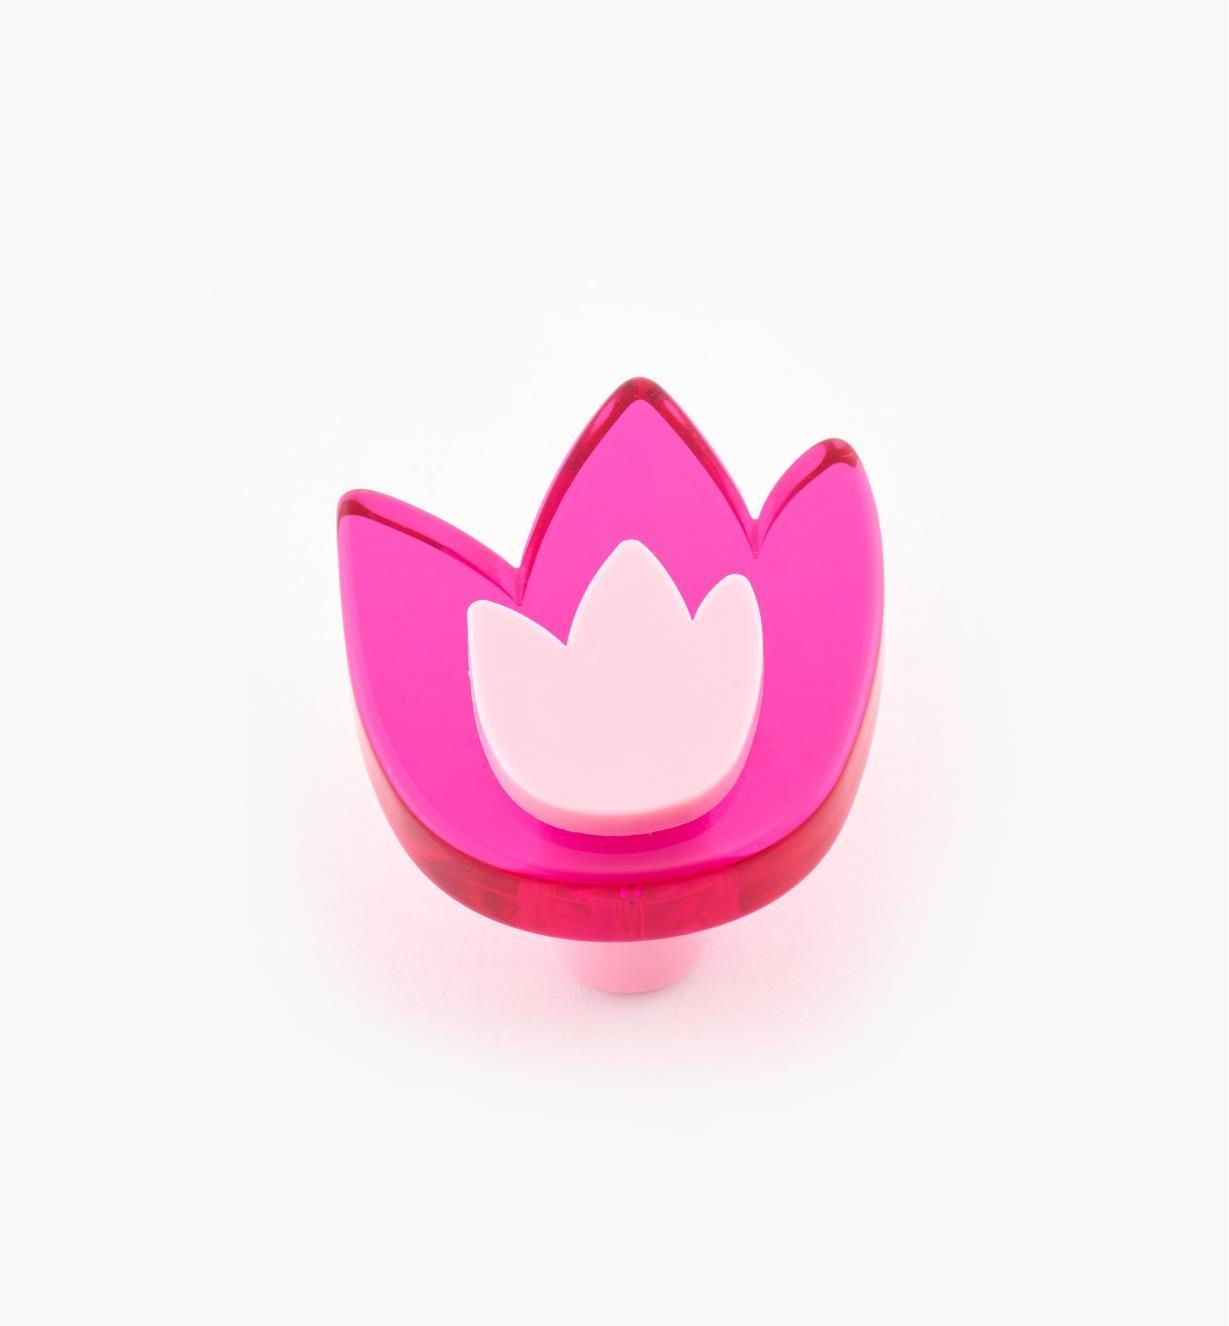 01W0572 - Tulip Knob, Fuchsia